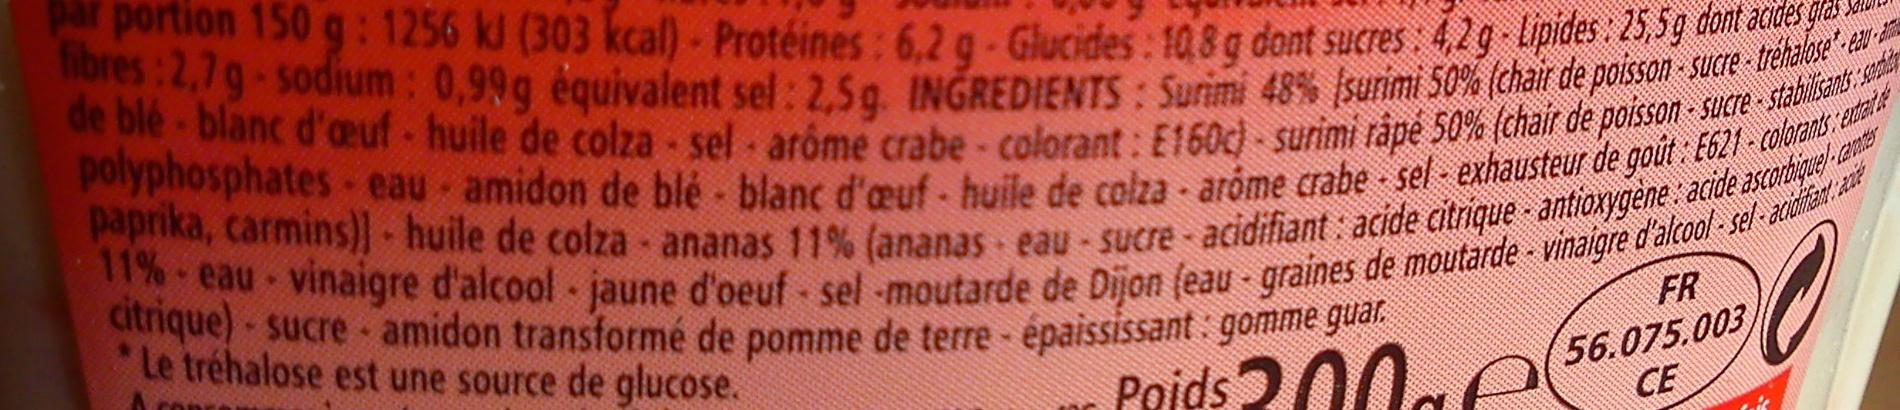 Salade de Surimi, Carottes Ananas - Ingrédients - fr